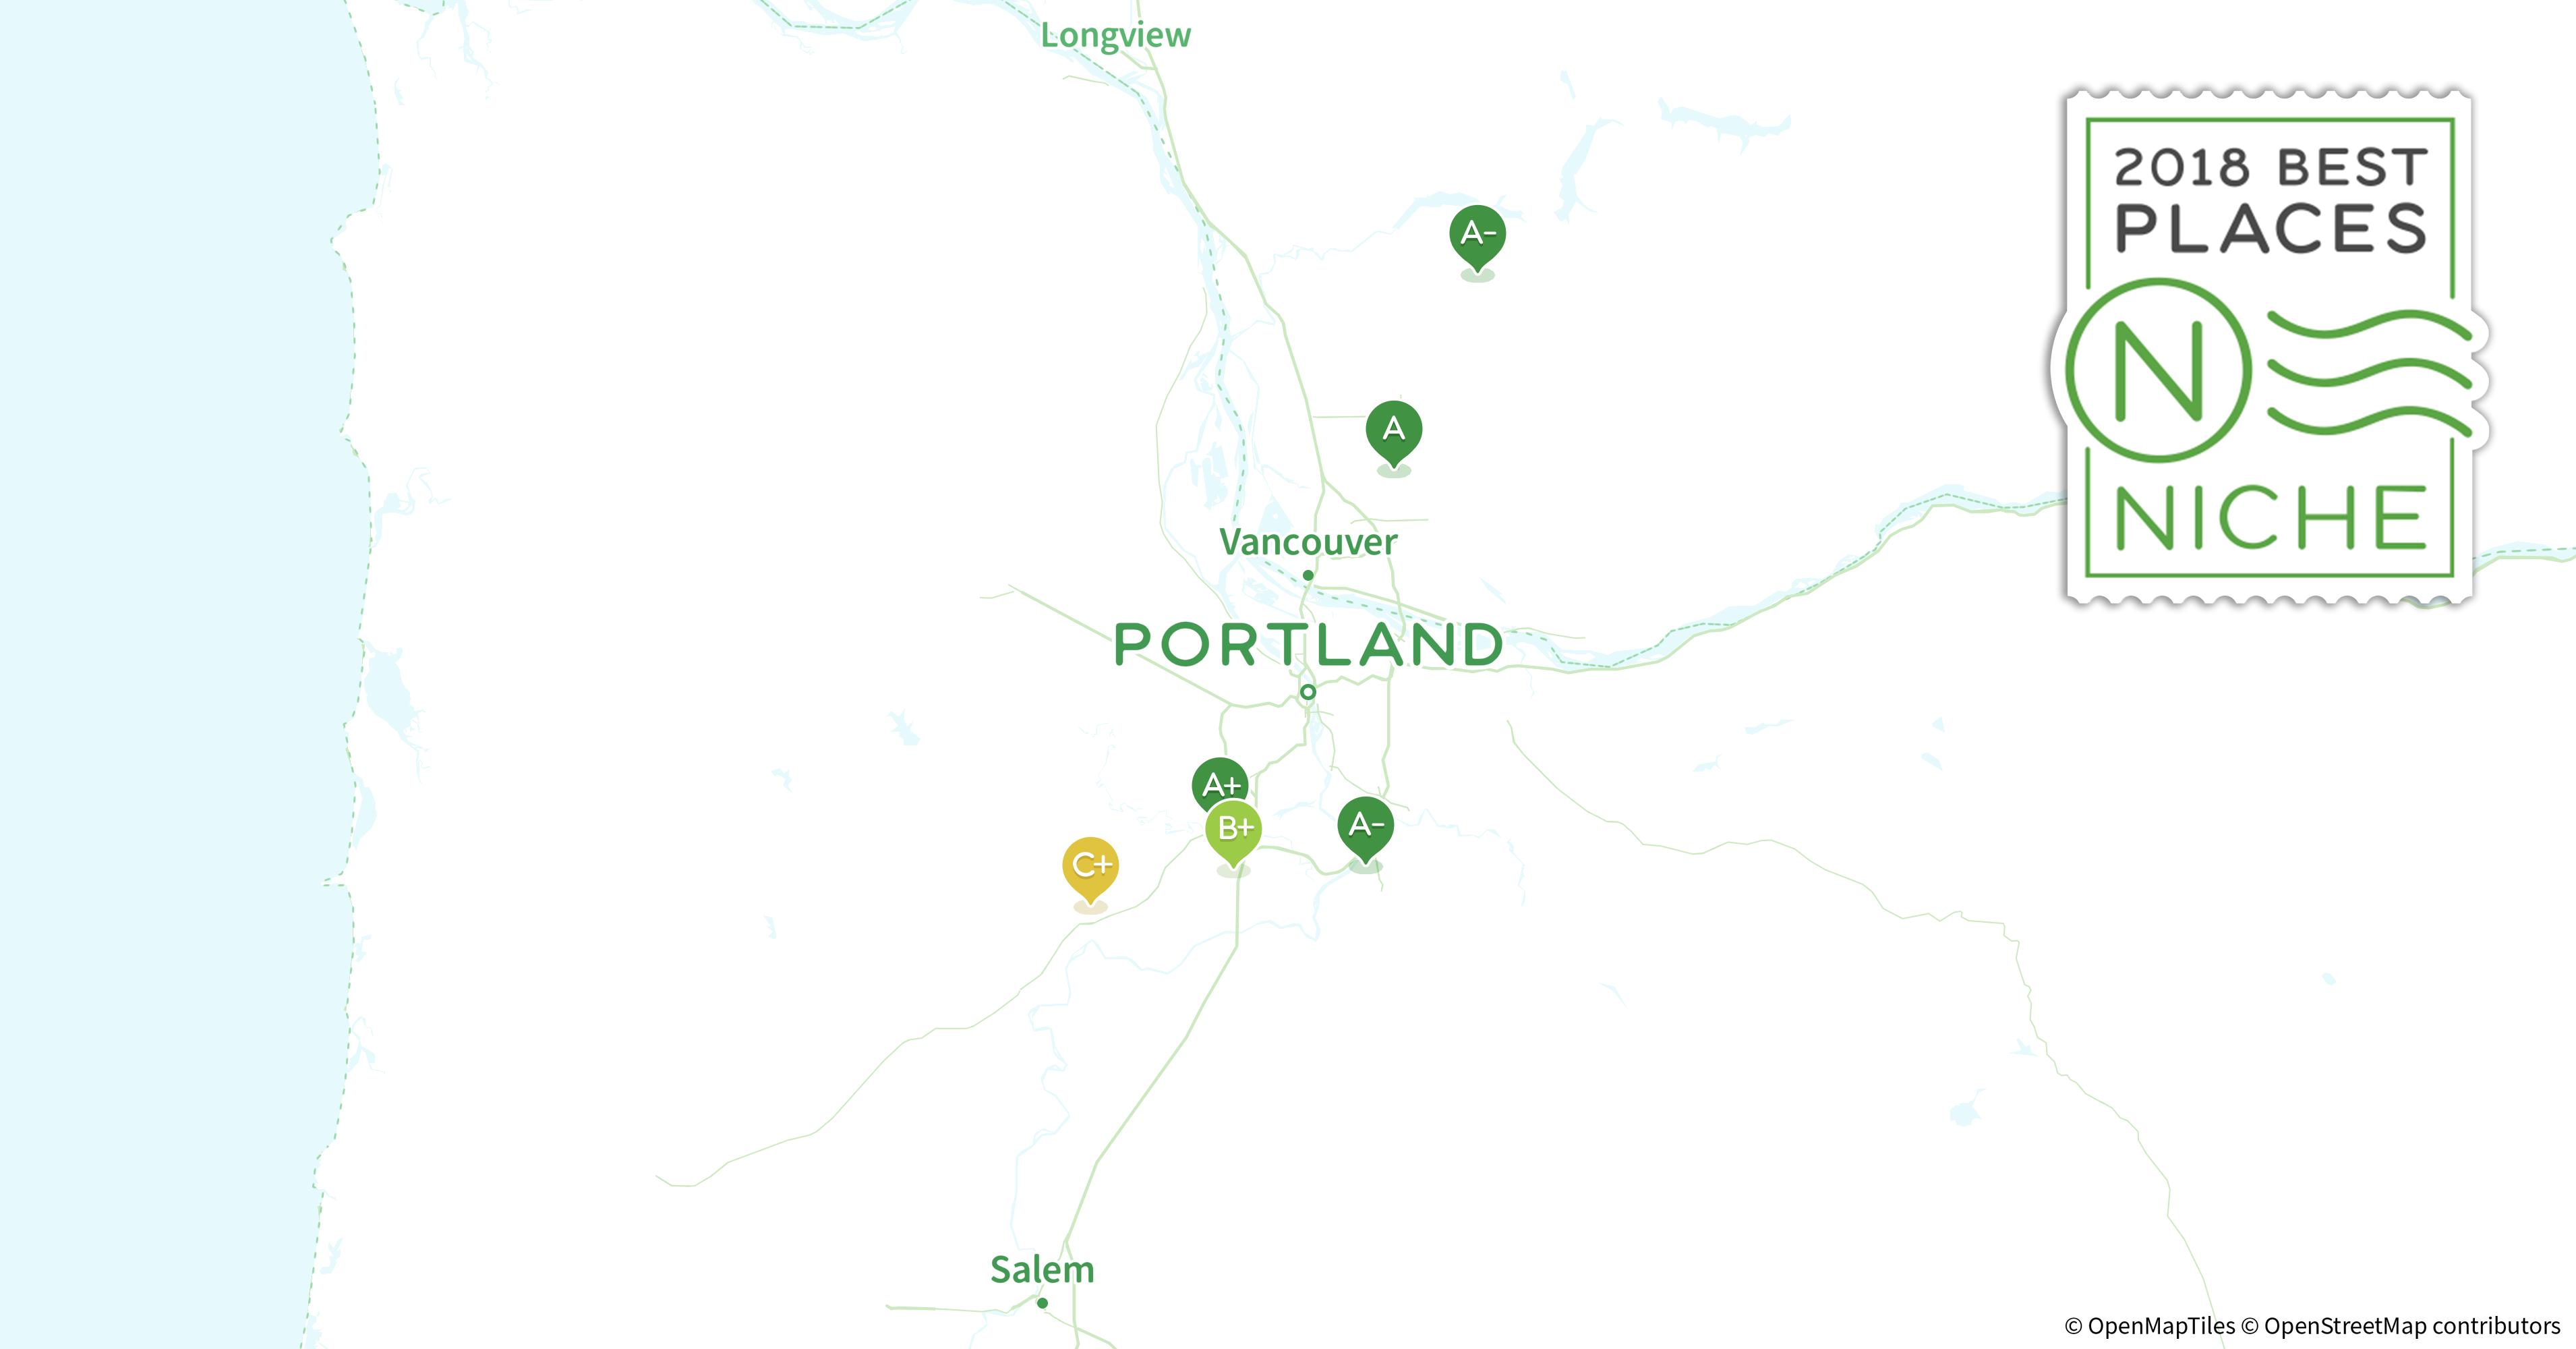 2018 Best Portland Area Suburbs to Live - Niche